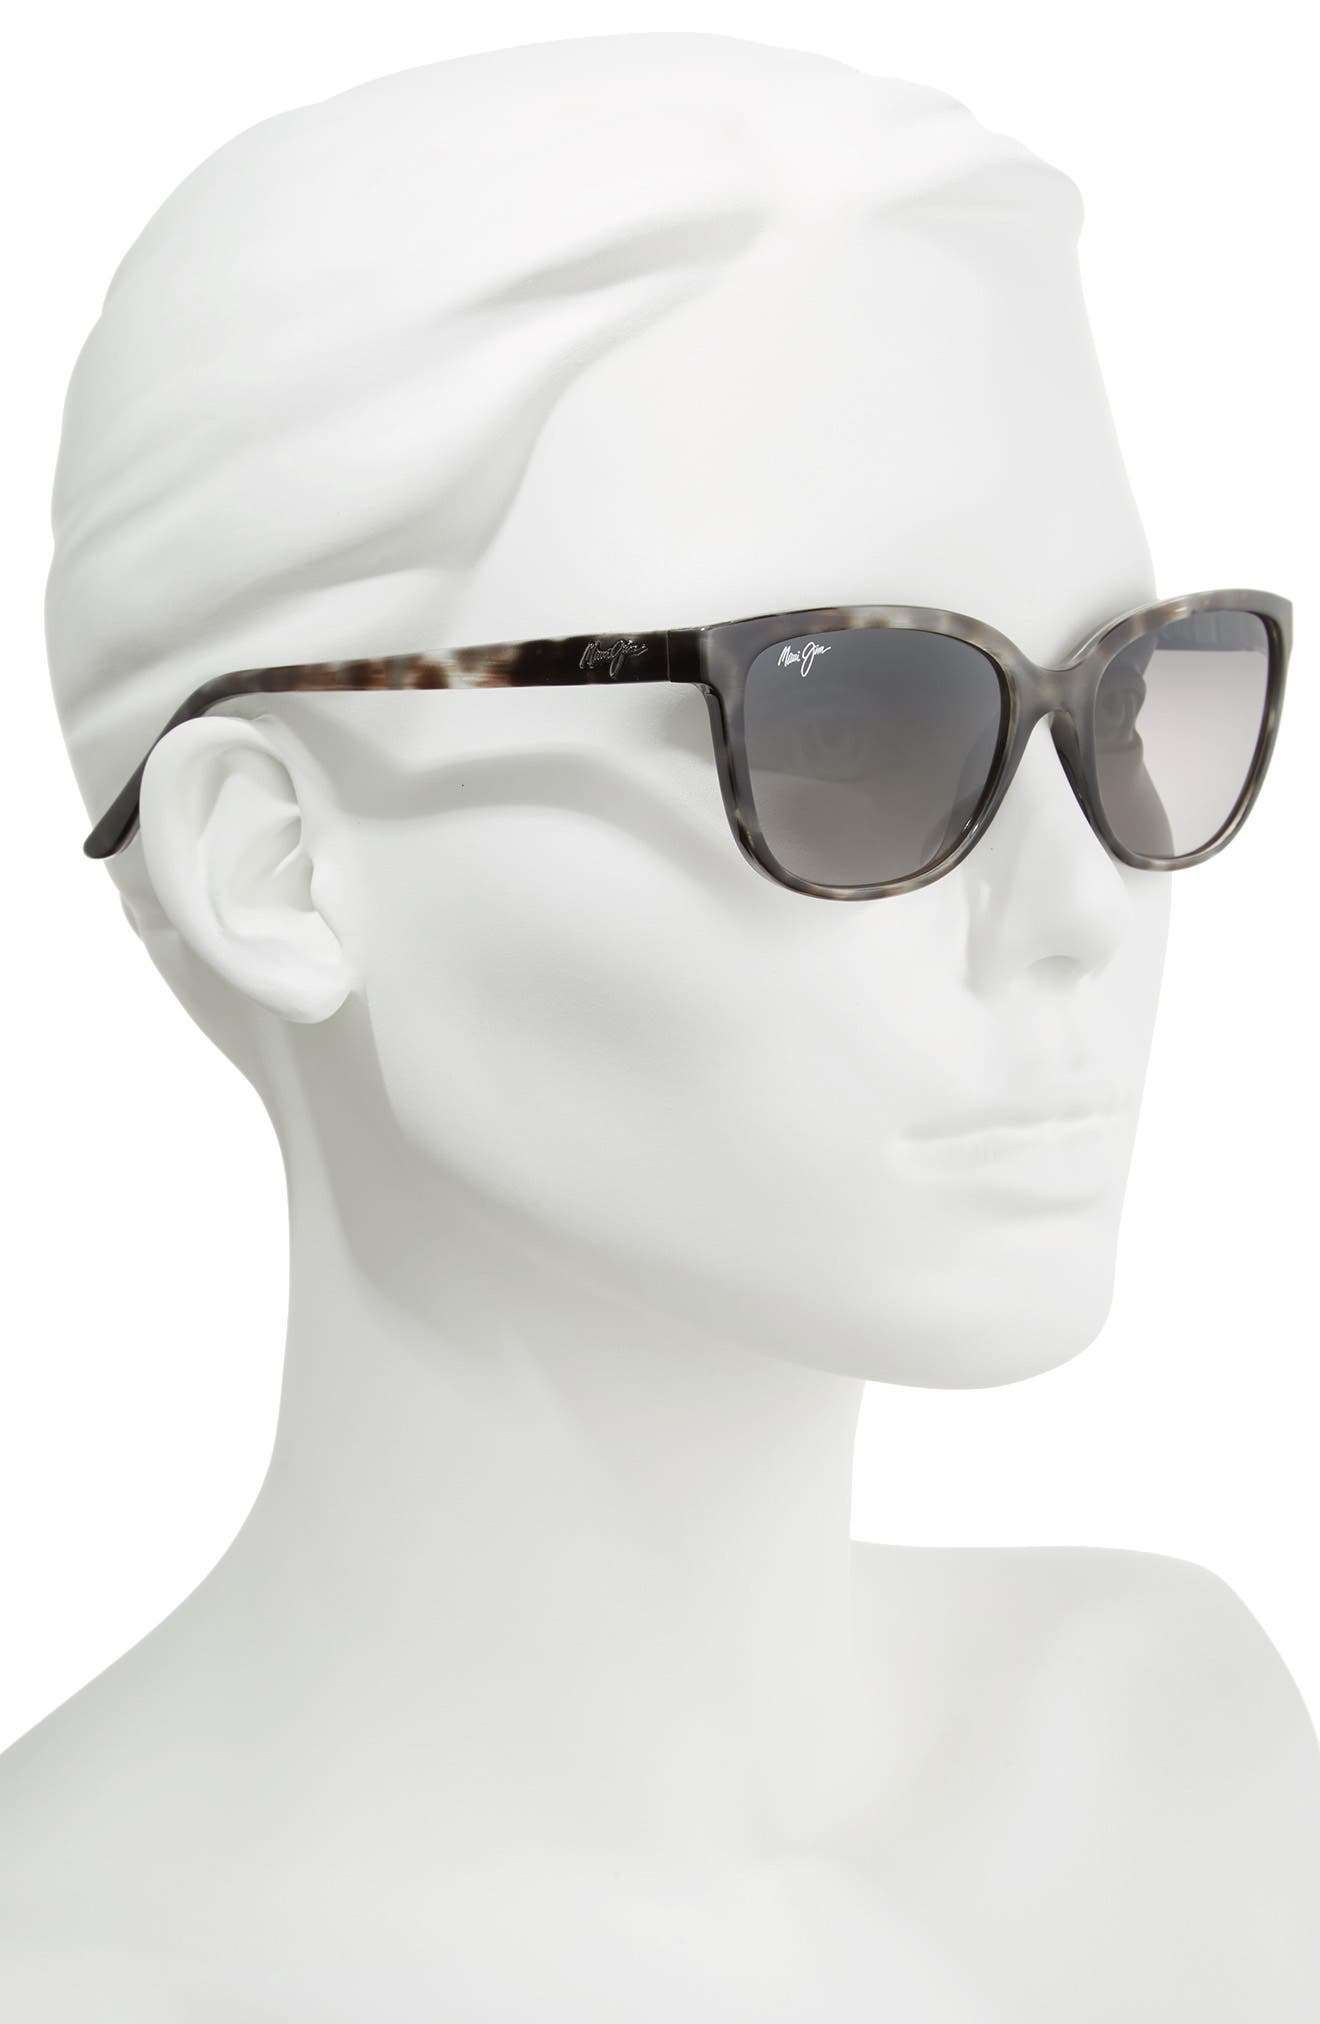 Honi 54mm Polarized Cat Eye Sunglasses,                             Alternate thumbnail 2, color,                             GREY TORTOISE STRIPE